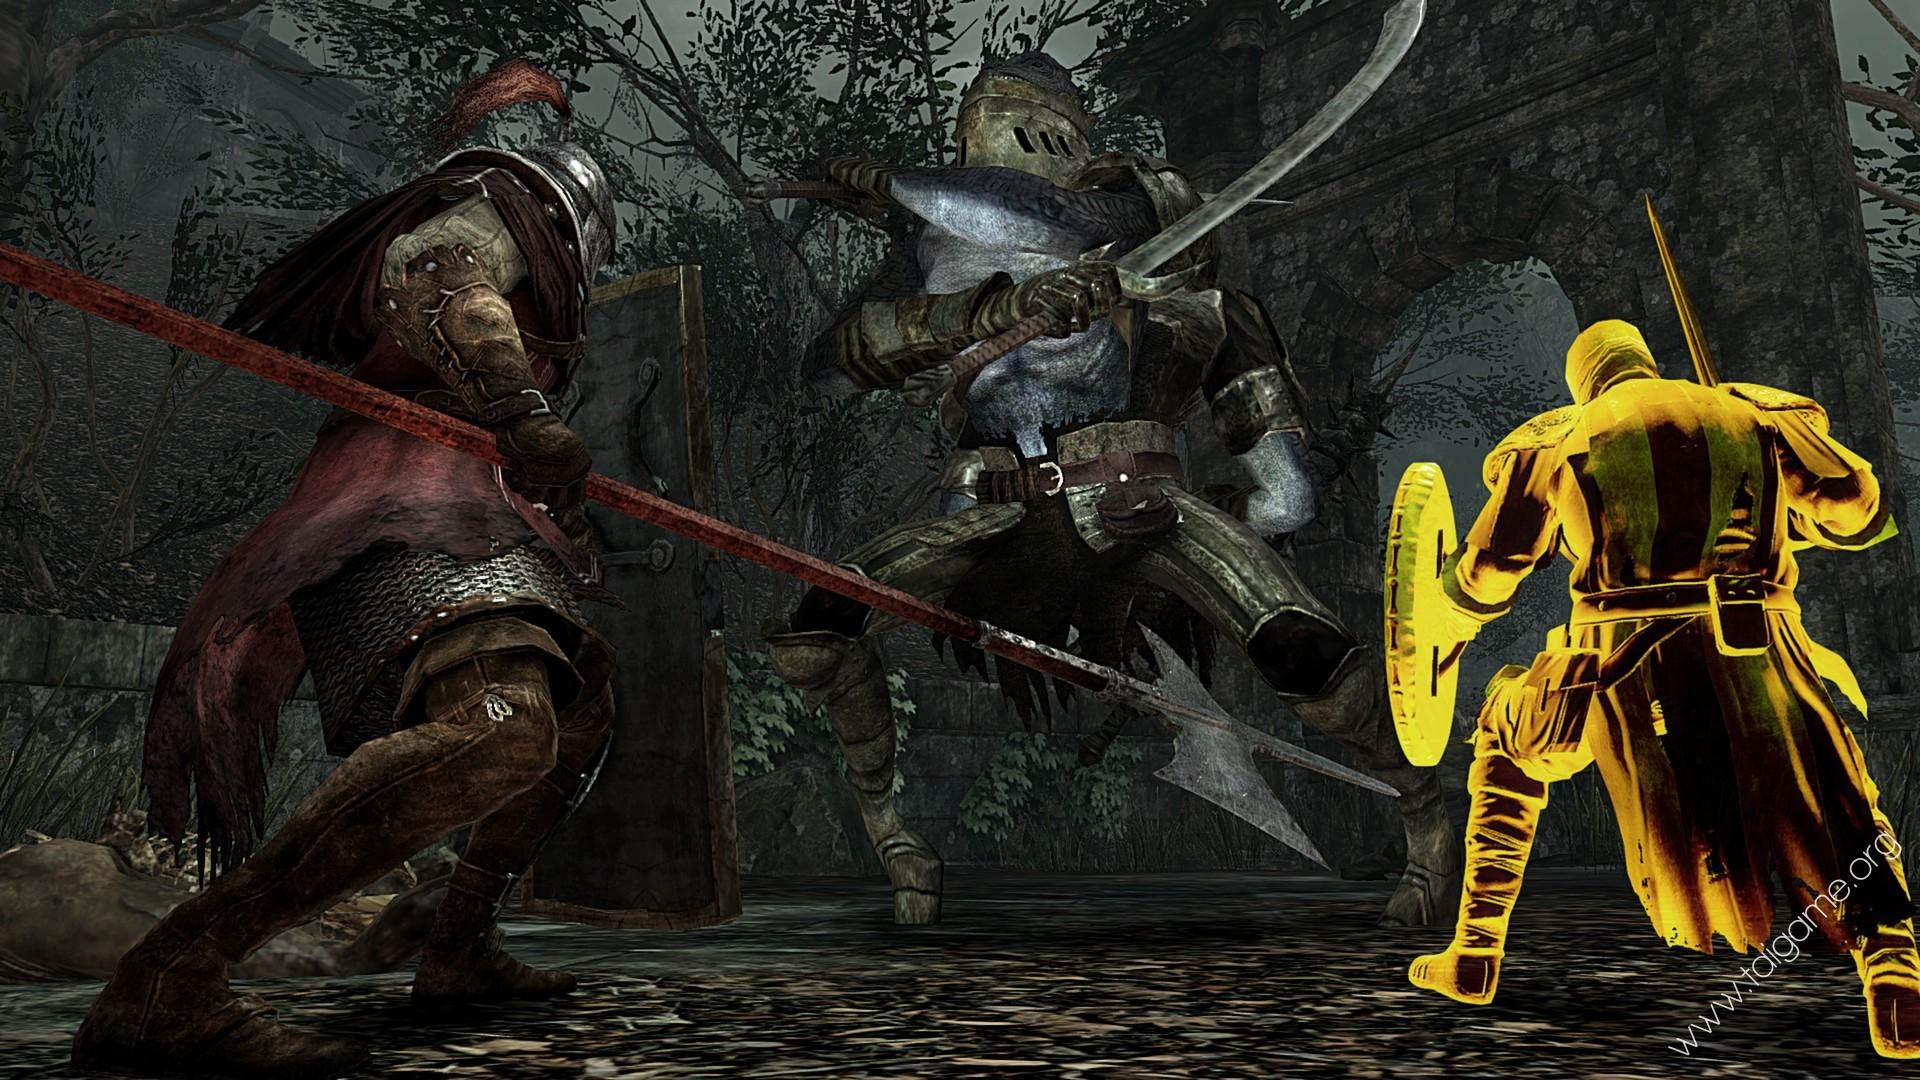 Dark Souls Ii: Dark Souls II (Vượt Qua Cái Chết)